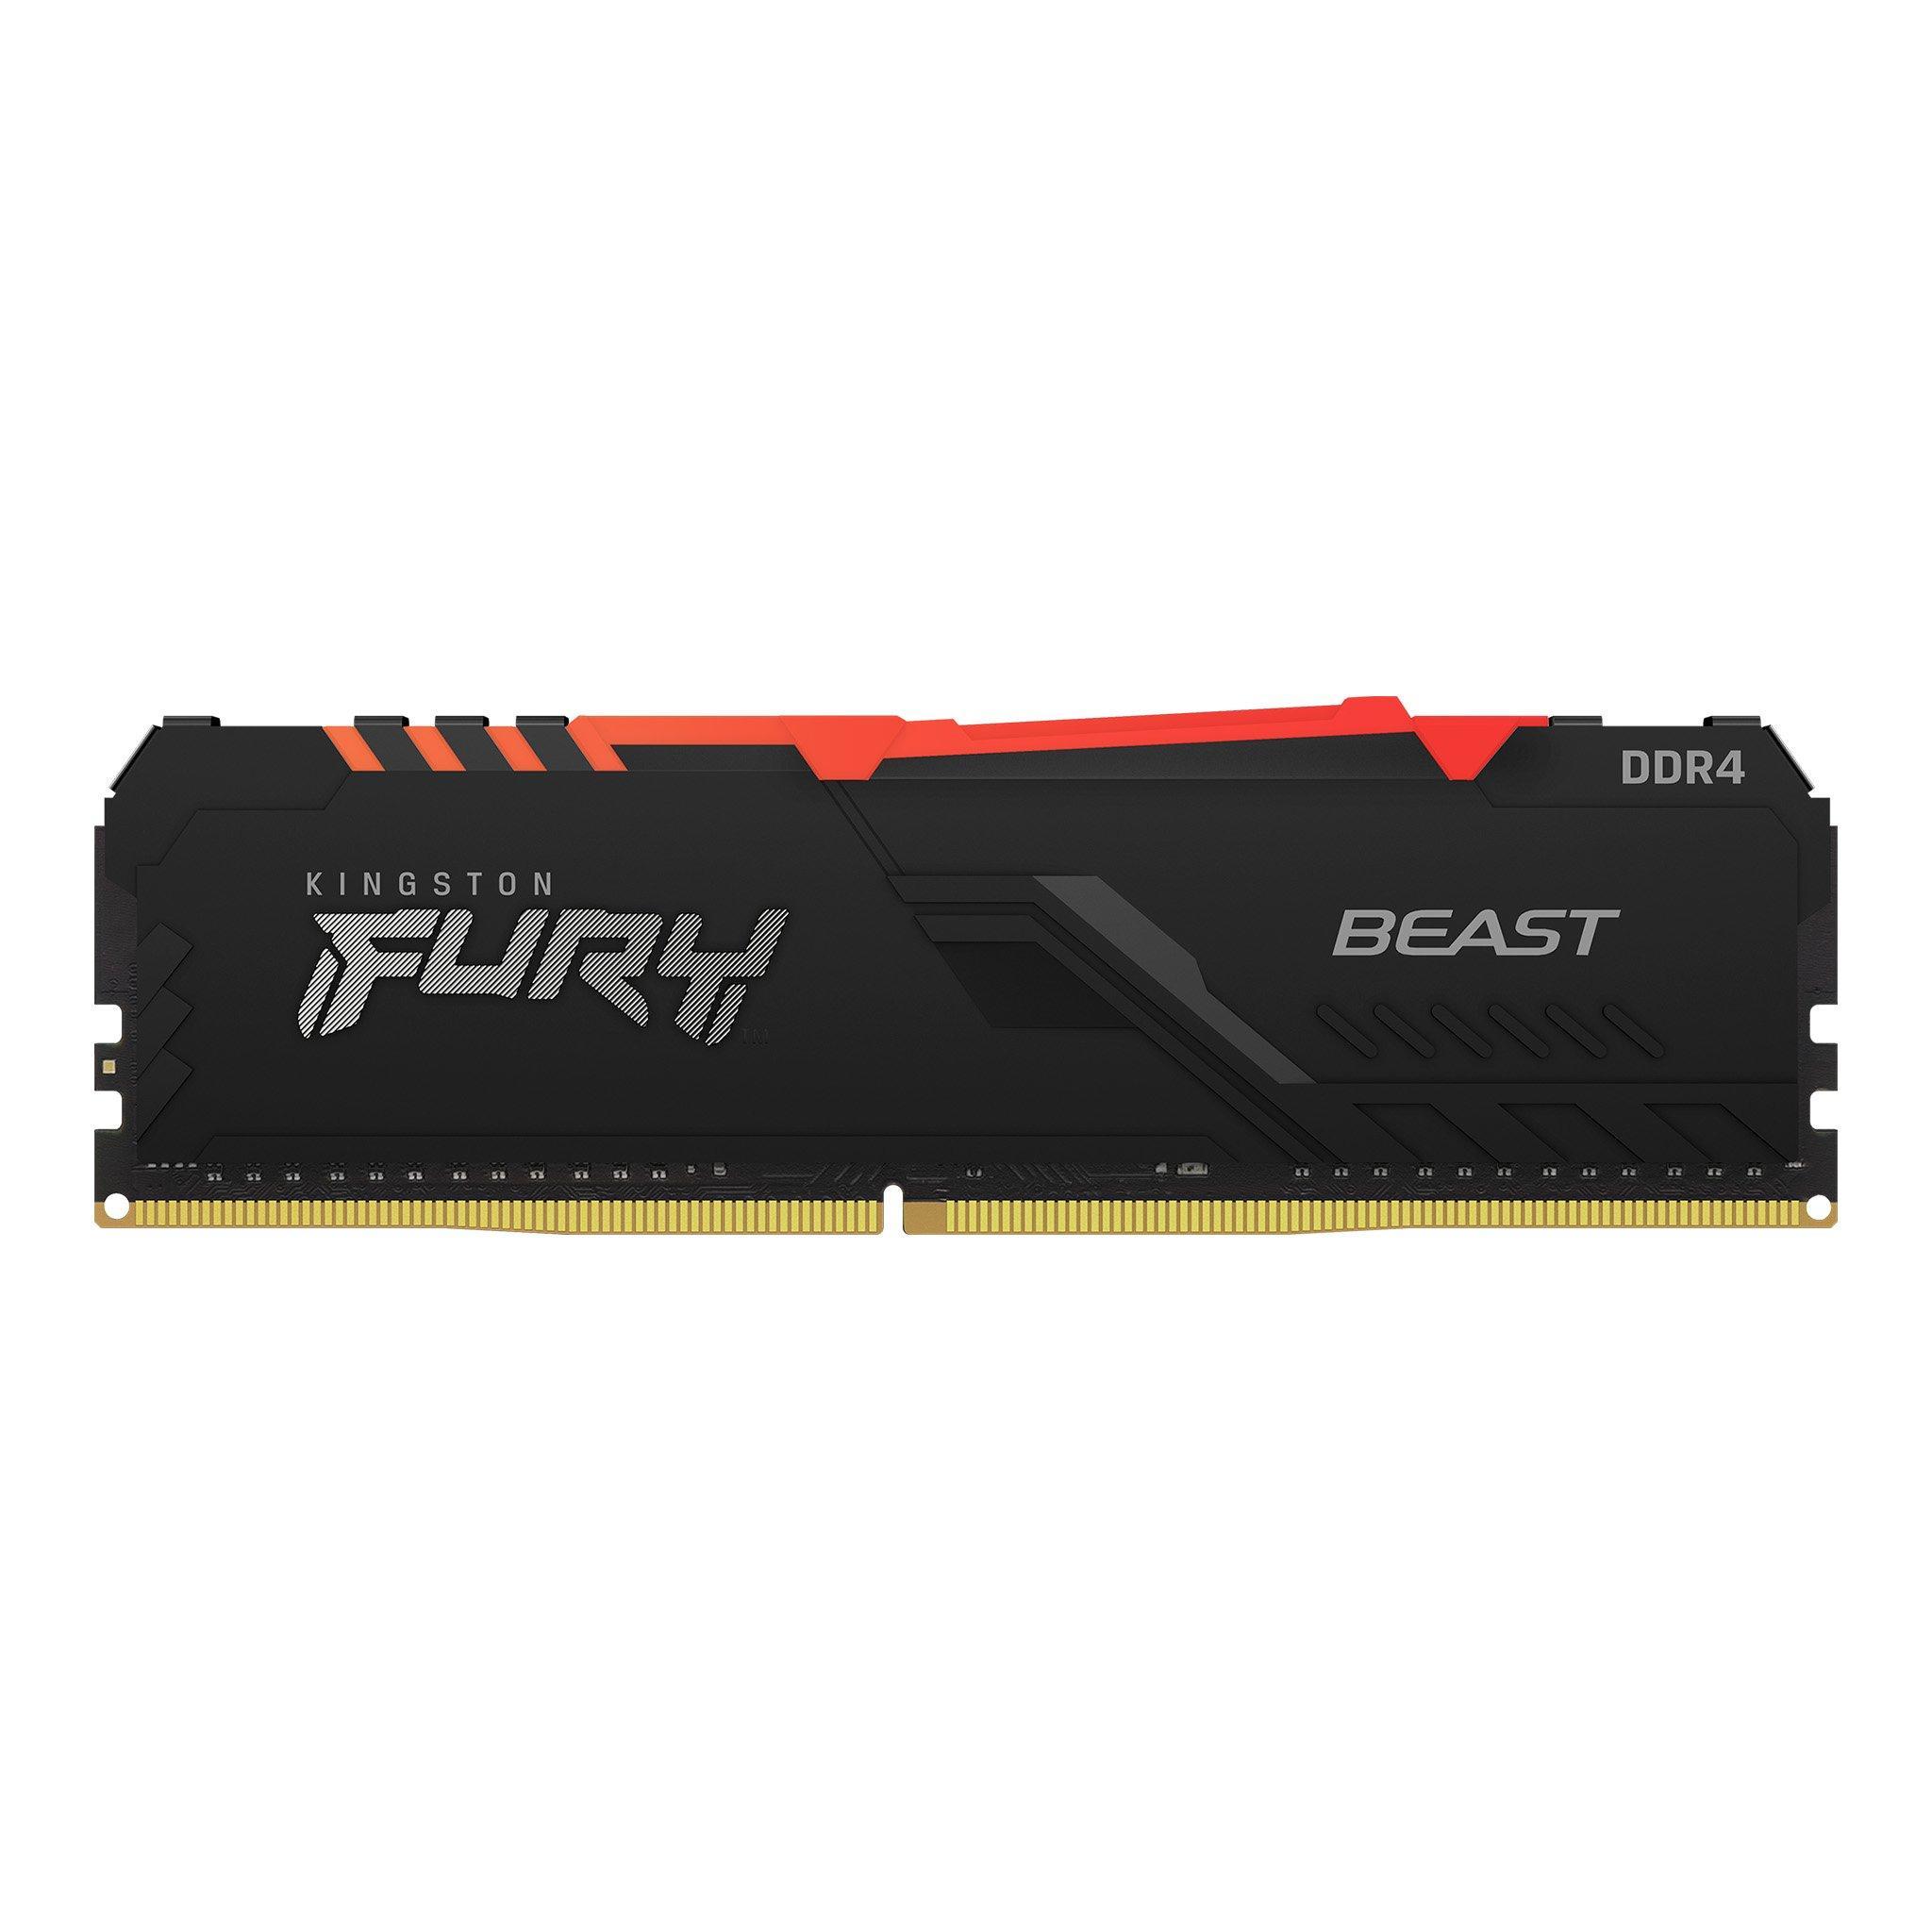 Памет Kingston FURY Beast Black RGB 32GB DDR4 PC4-25600 3200MHz CL16 KF432C16BBA/32